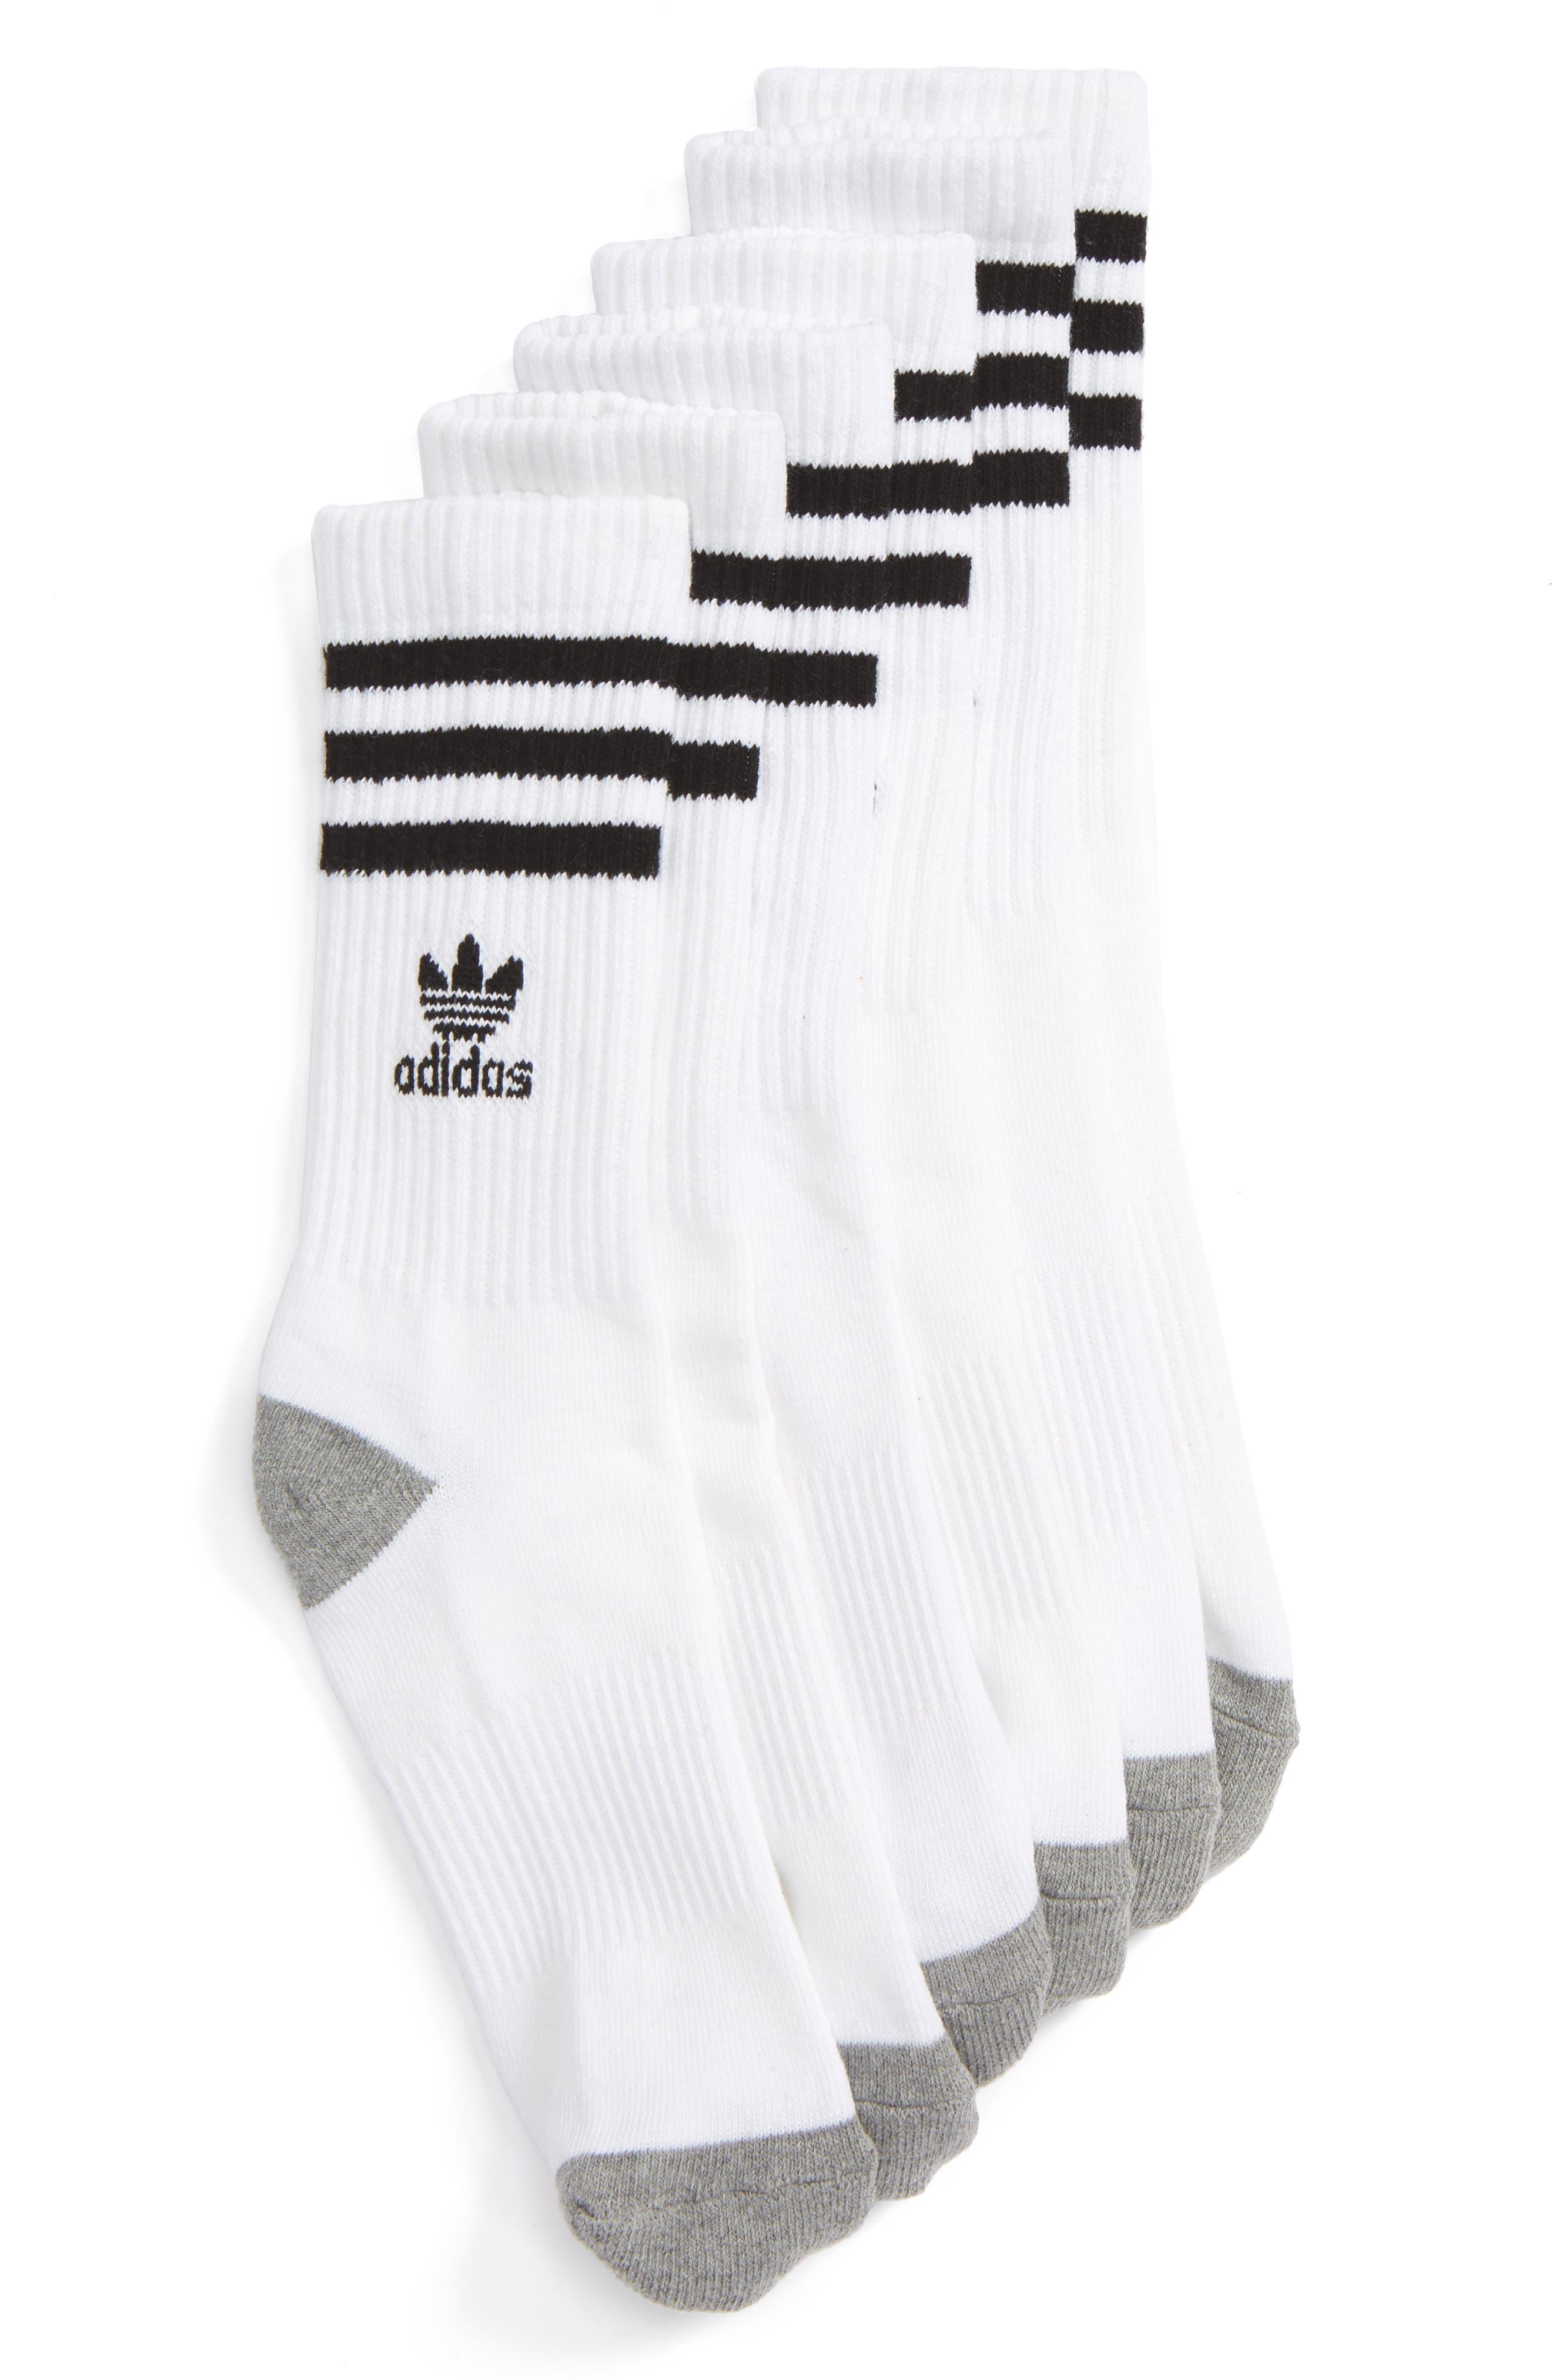 adidas 3-Pack Original Cushioned Crew Socks